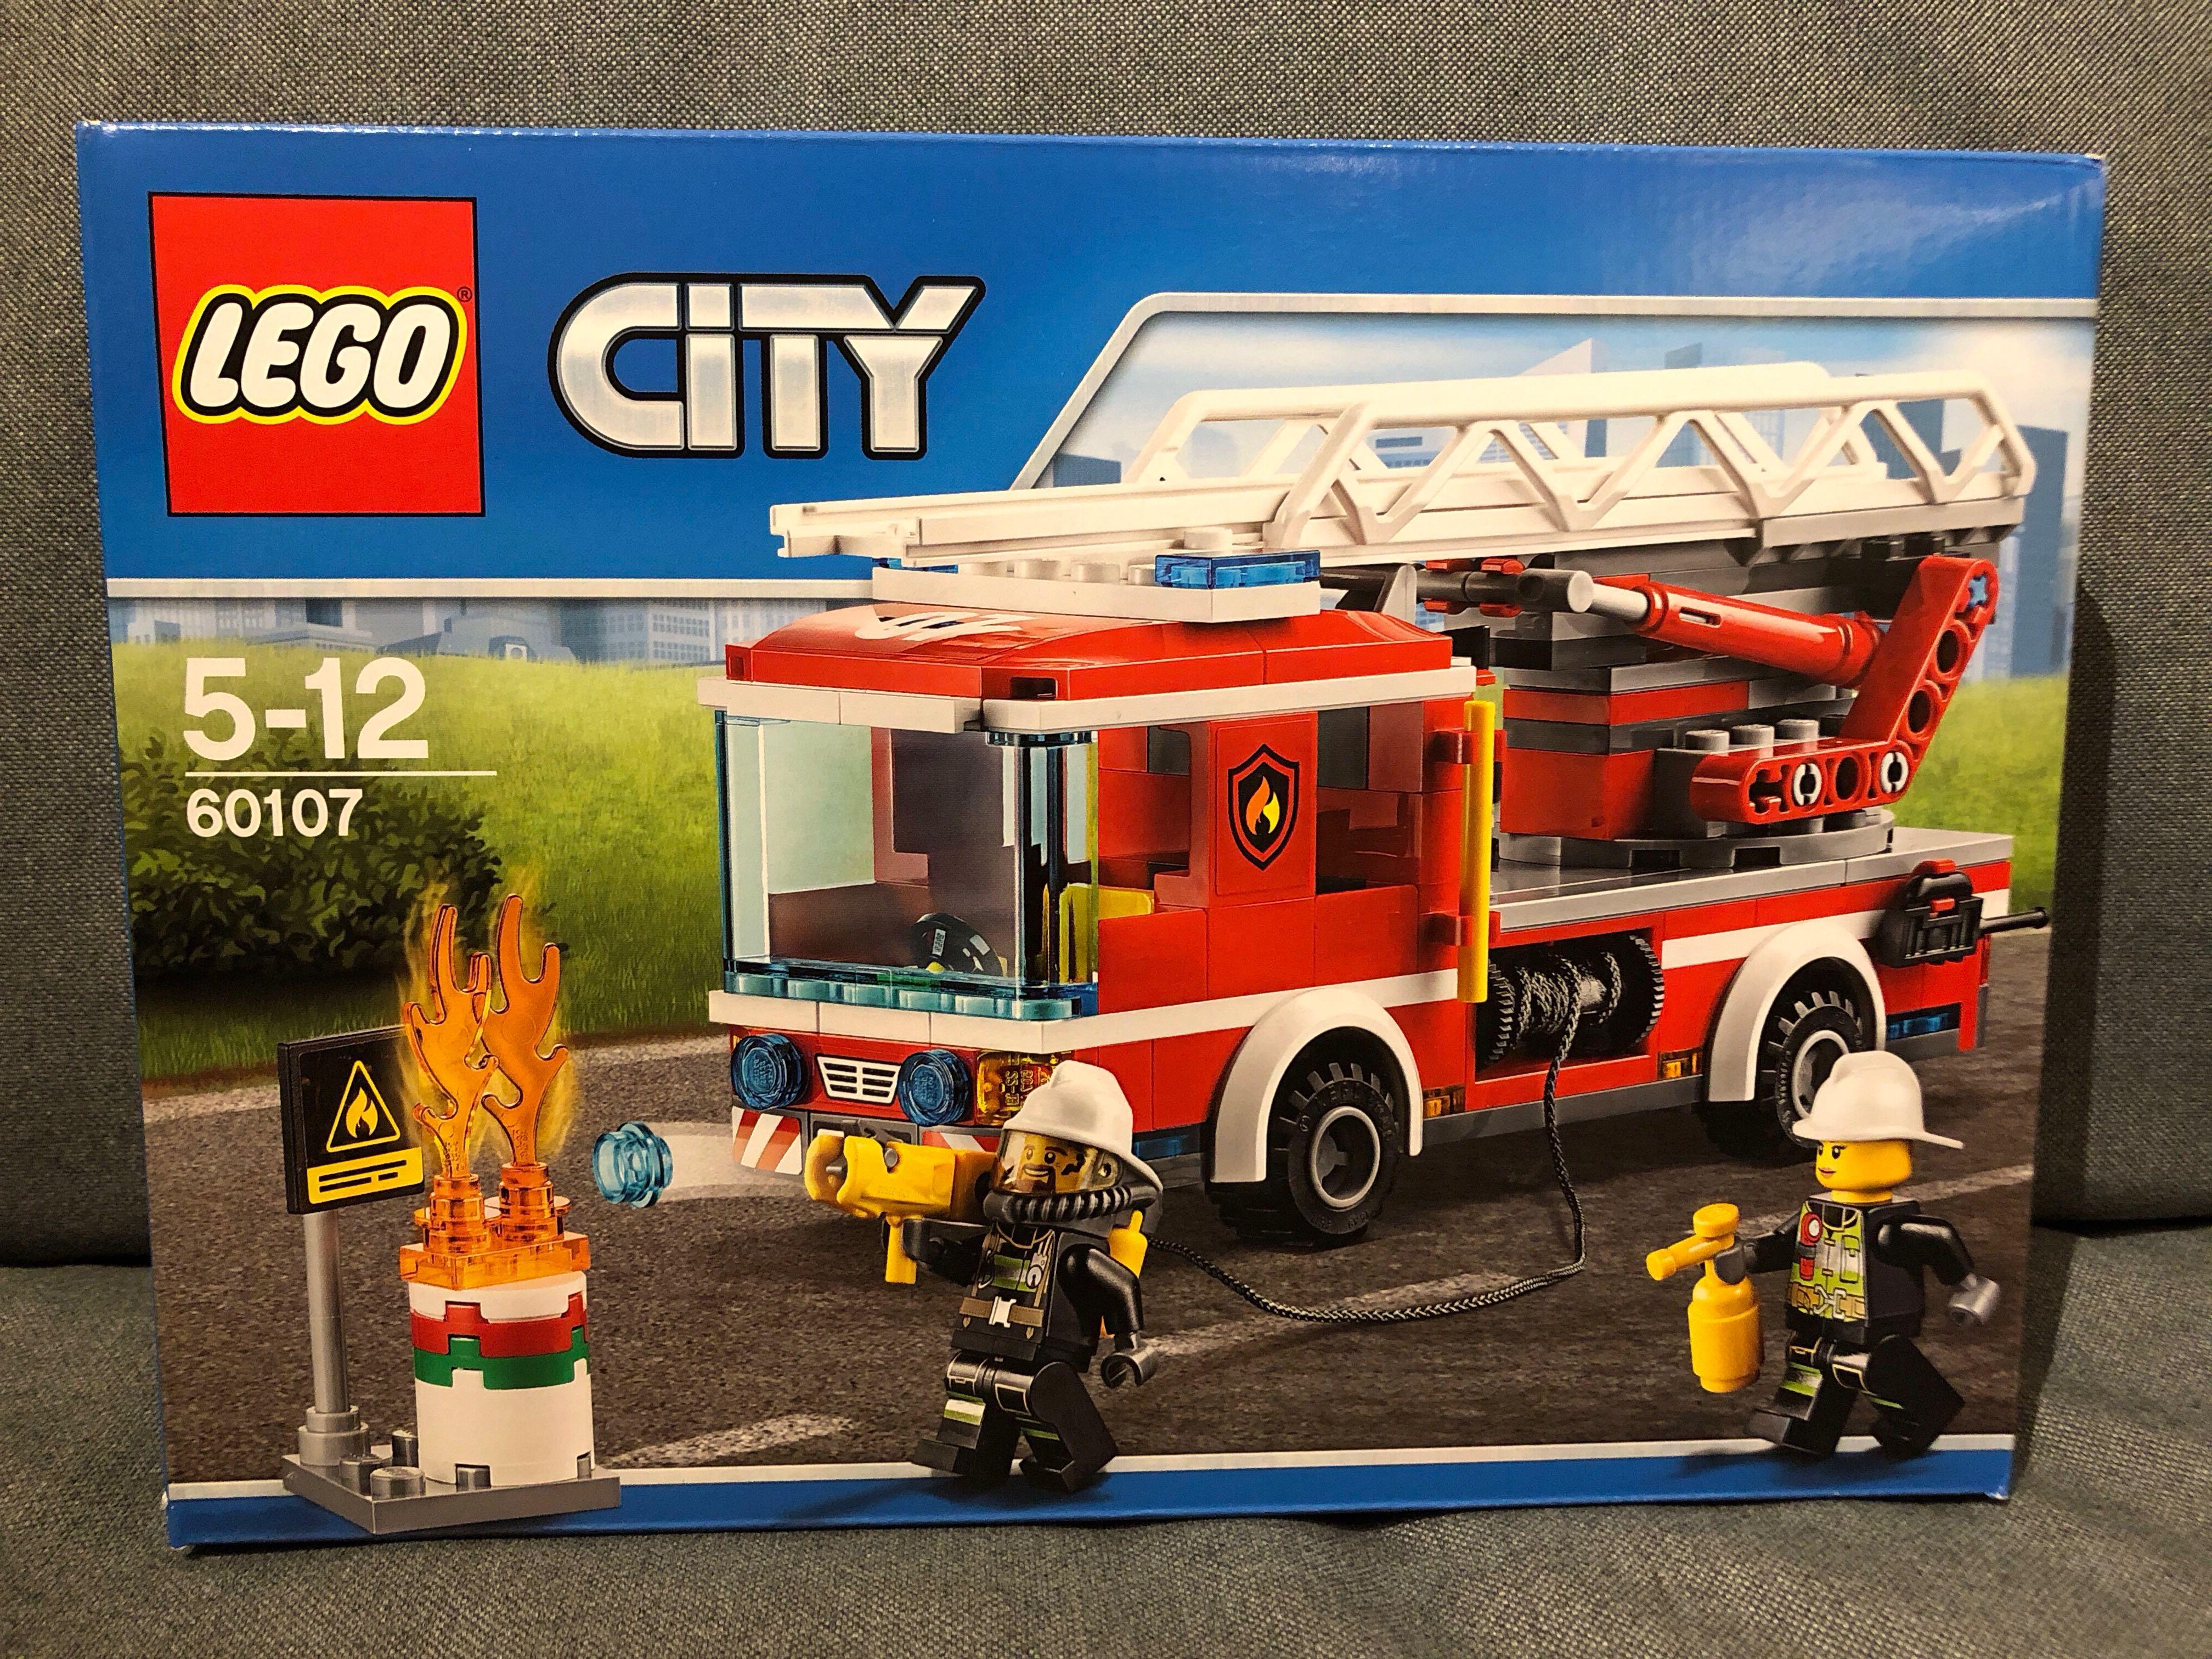 Lego City 60107 Fire Ladder Truck Toys Games Bricks Figurines